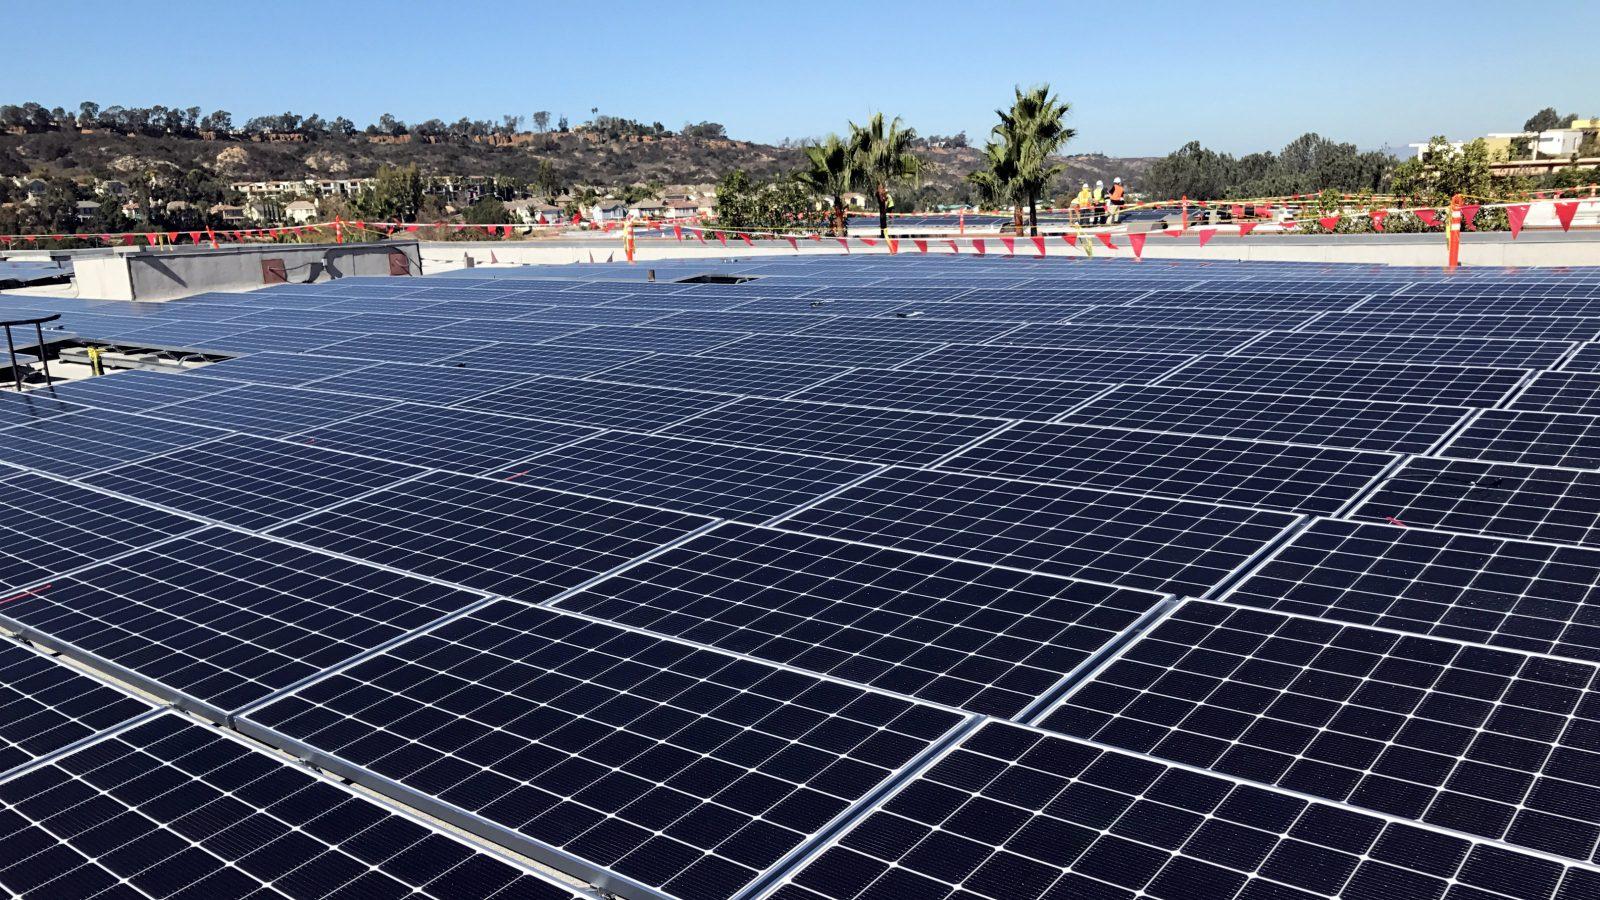 North Coast Health Center Completes 256 Kilowatt Roof-Top Solar Installation